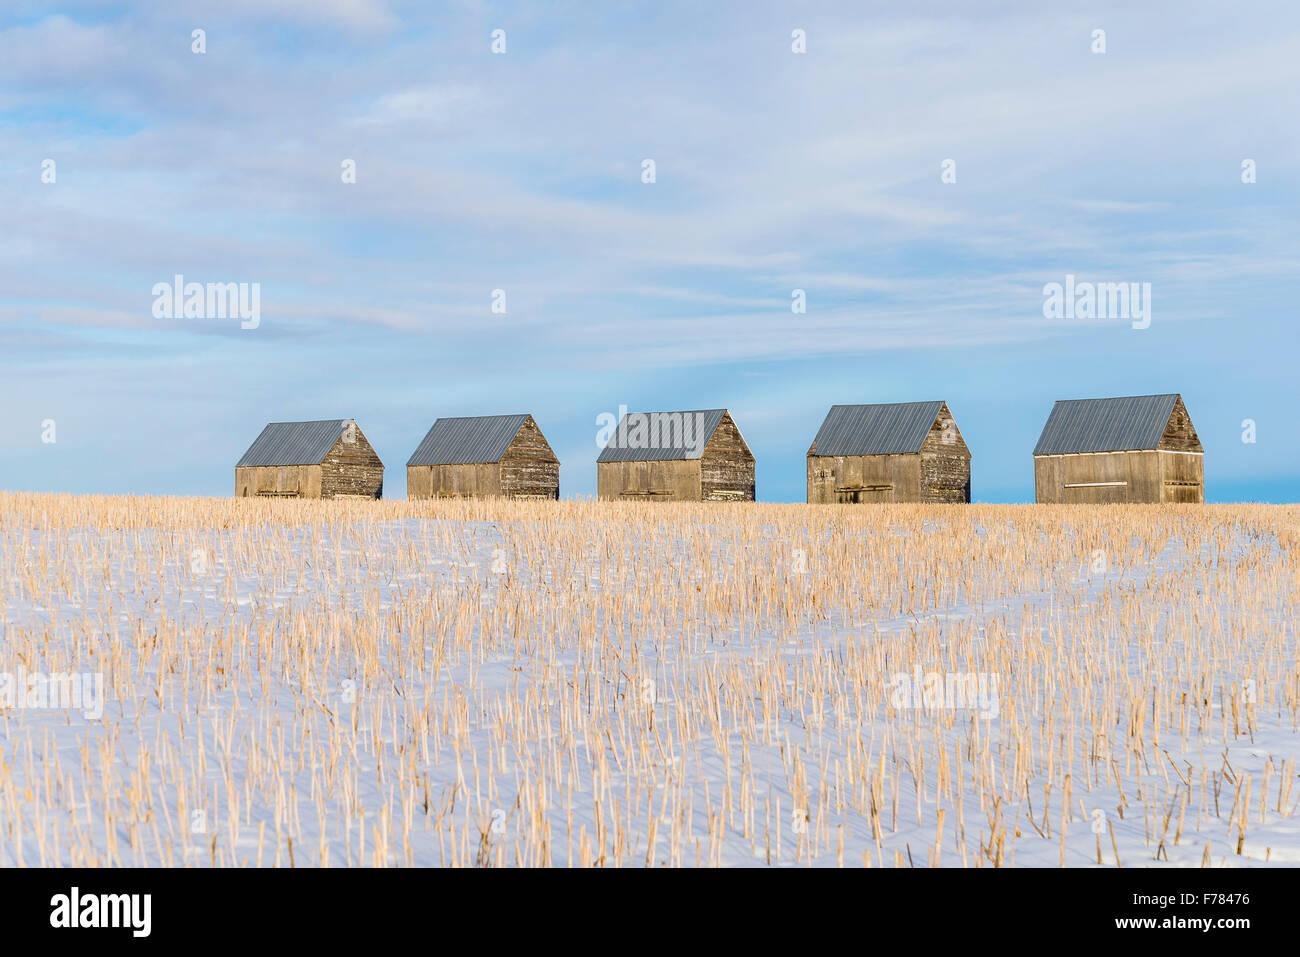 Row of barns in winter, Kneehill County, Alberta, Canada - Stock Image